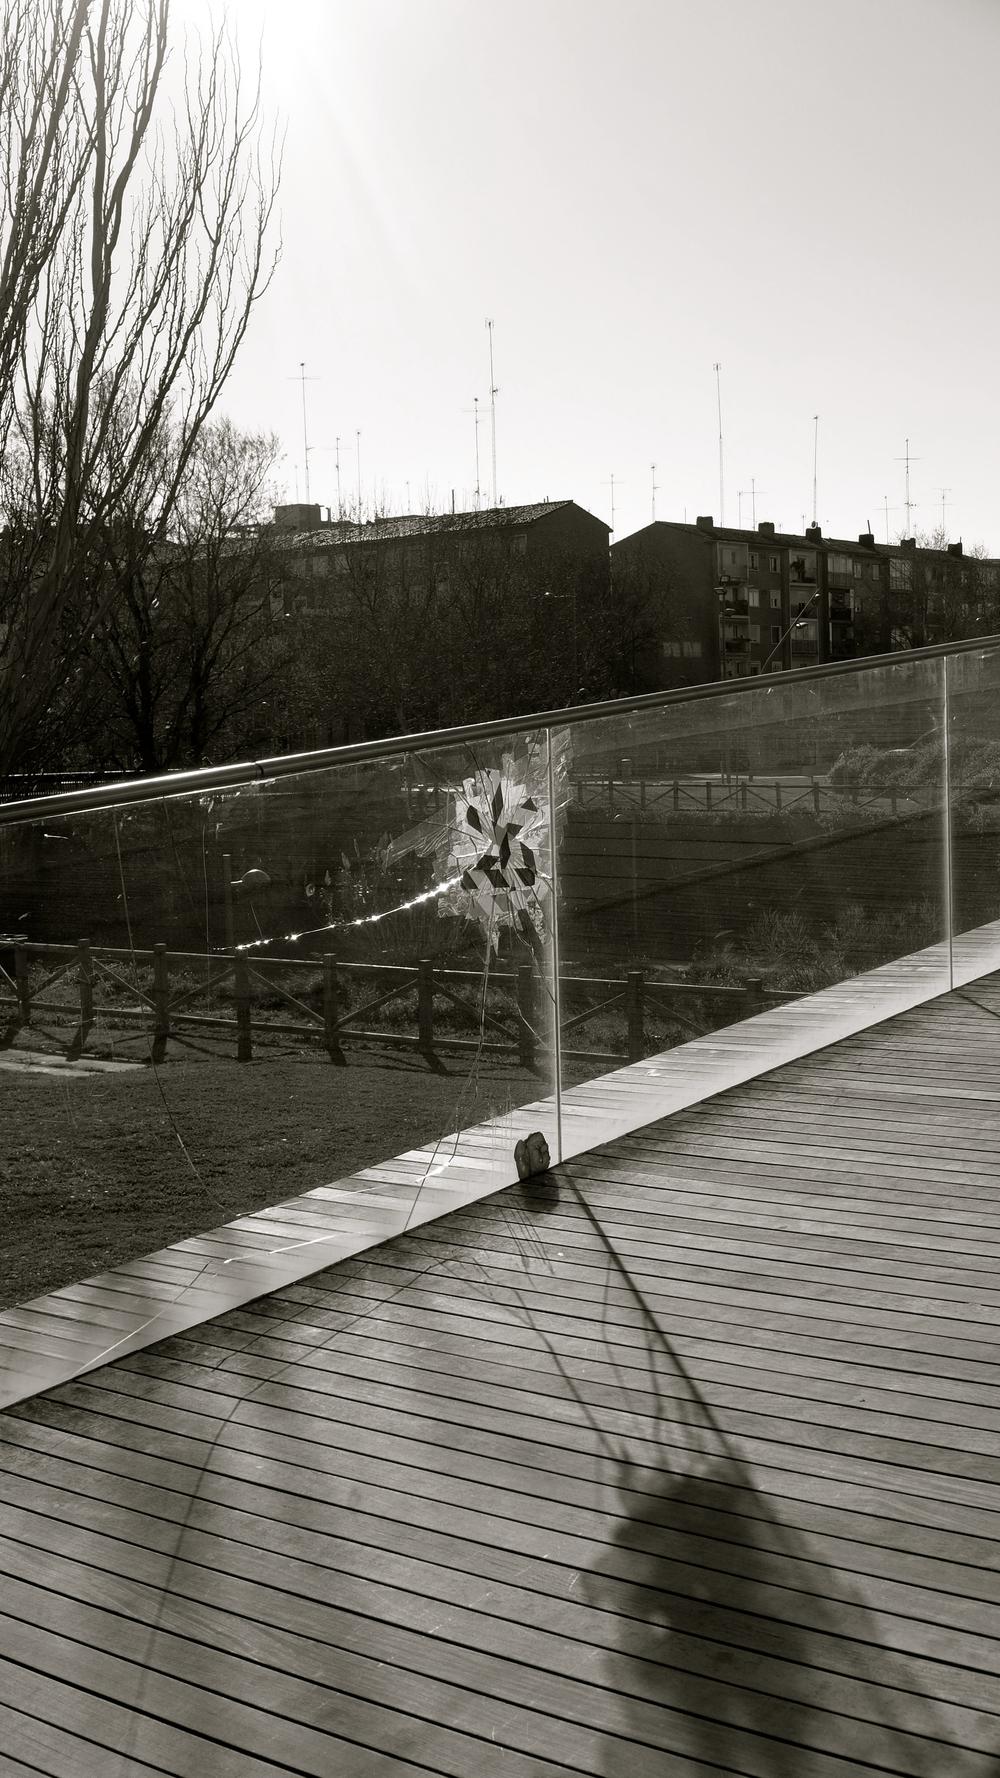 Arte casual en la desembocadura del Huerva - 6